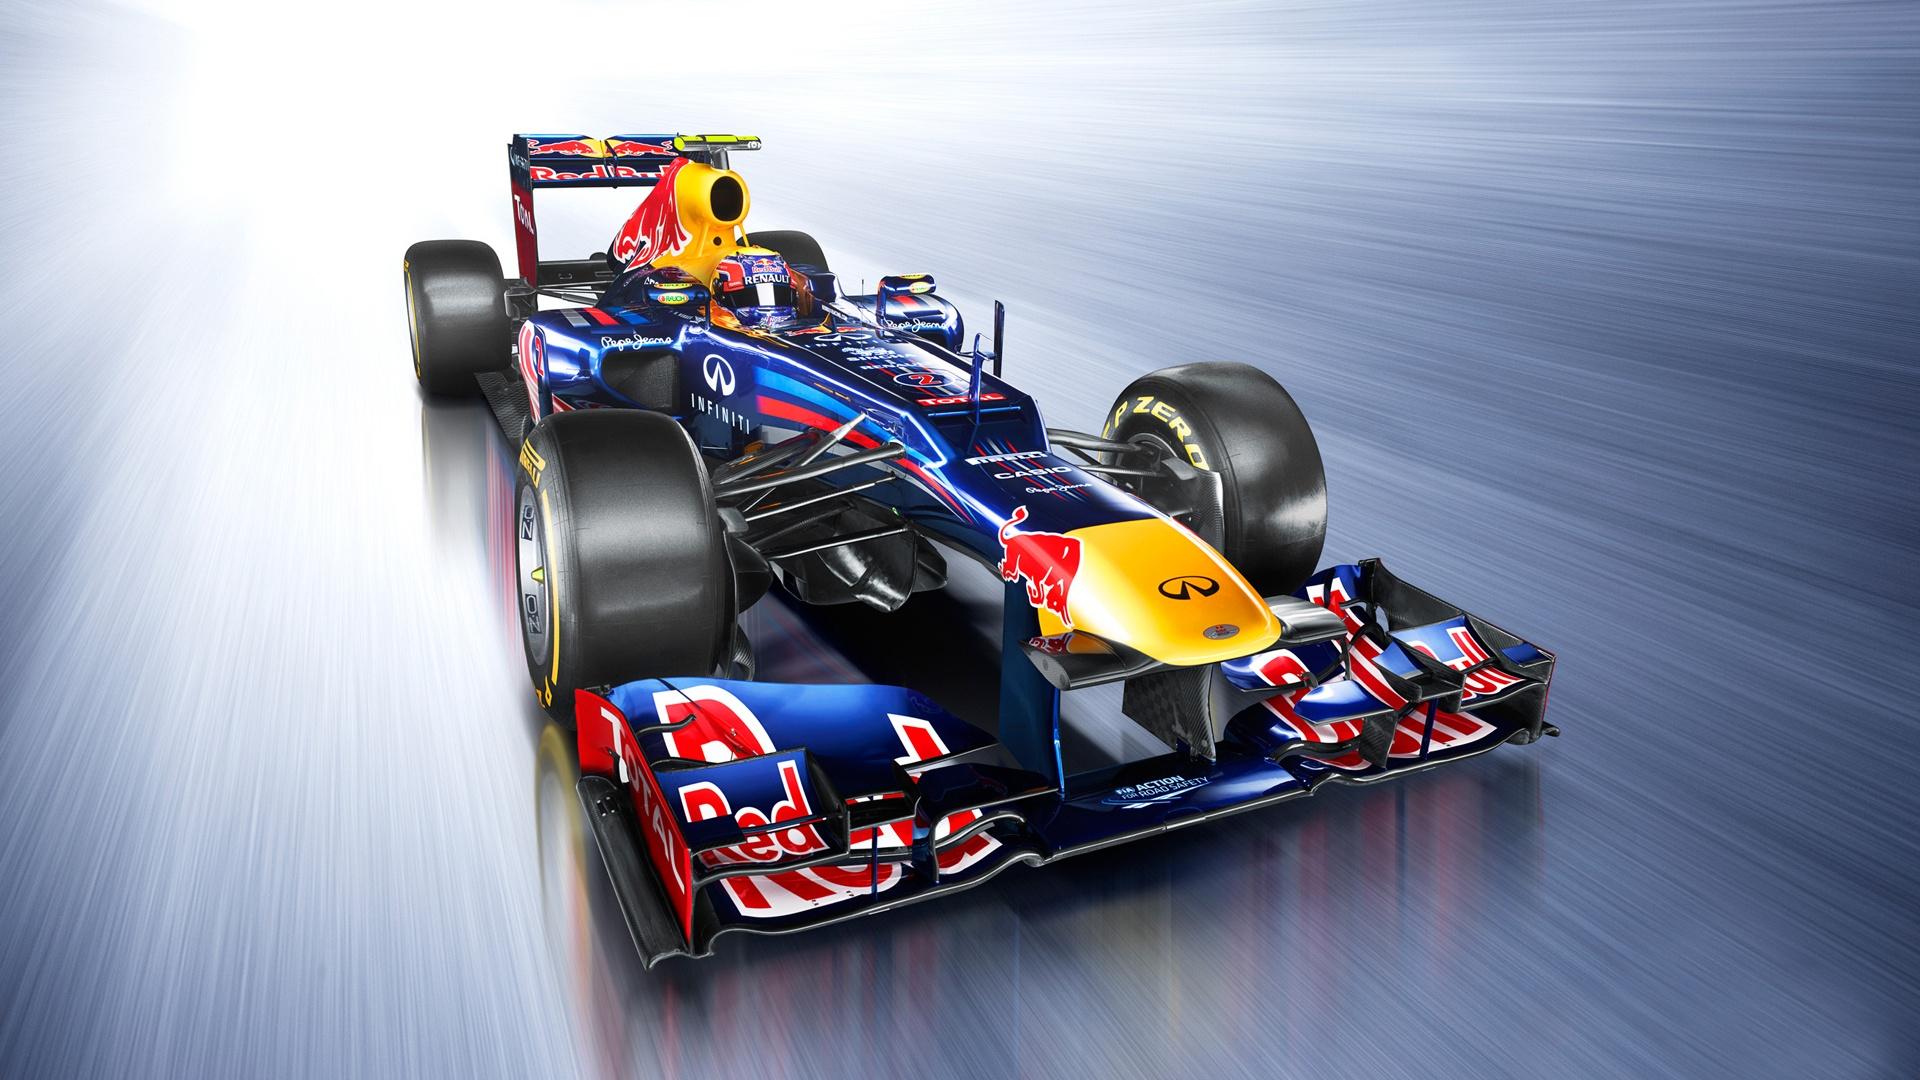 Download wallpapers Aston Martin Red Bull Racing 4k logo